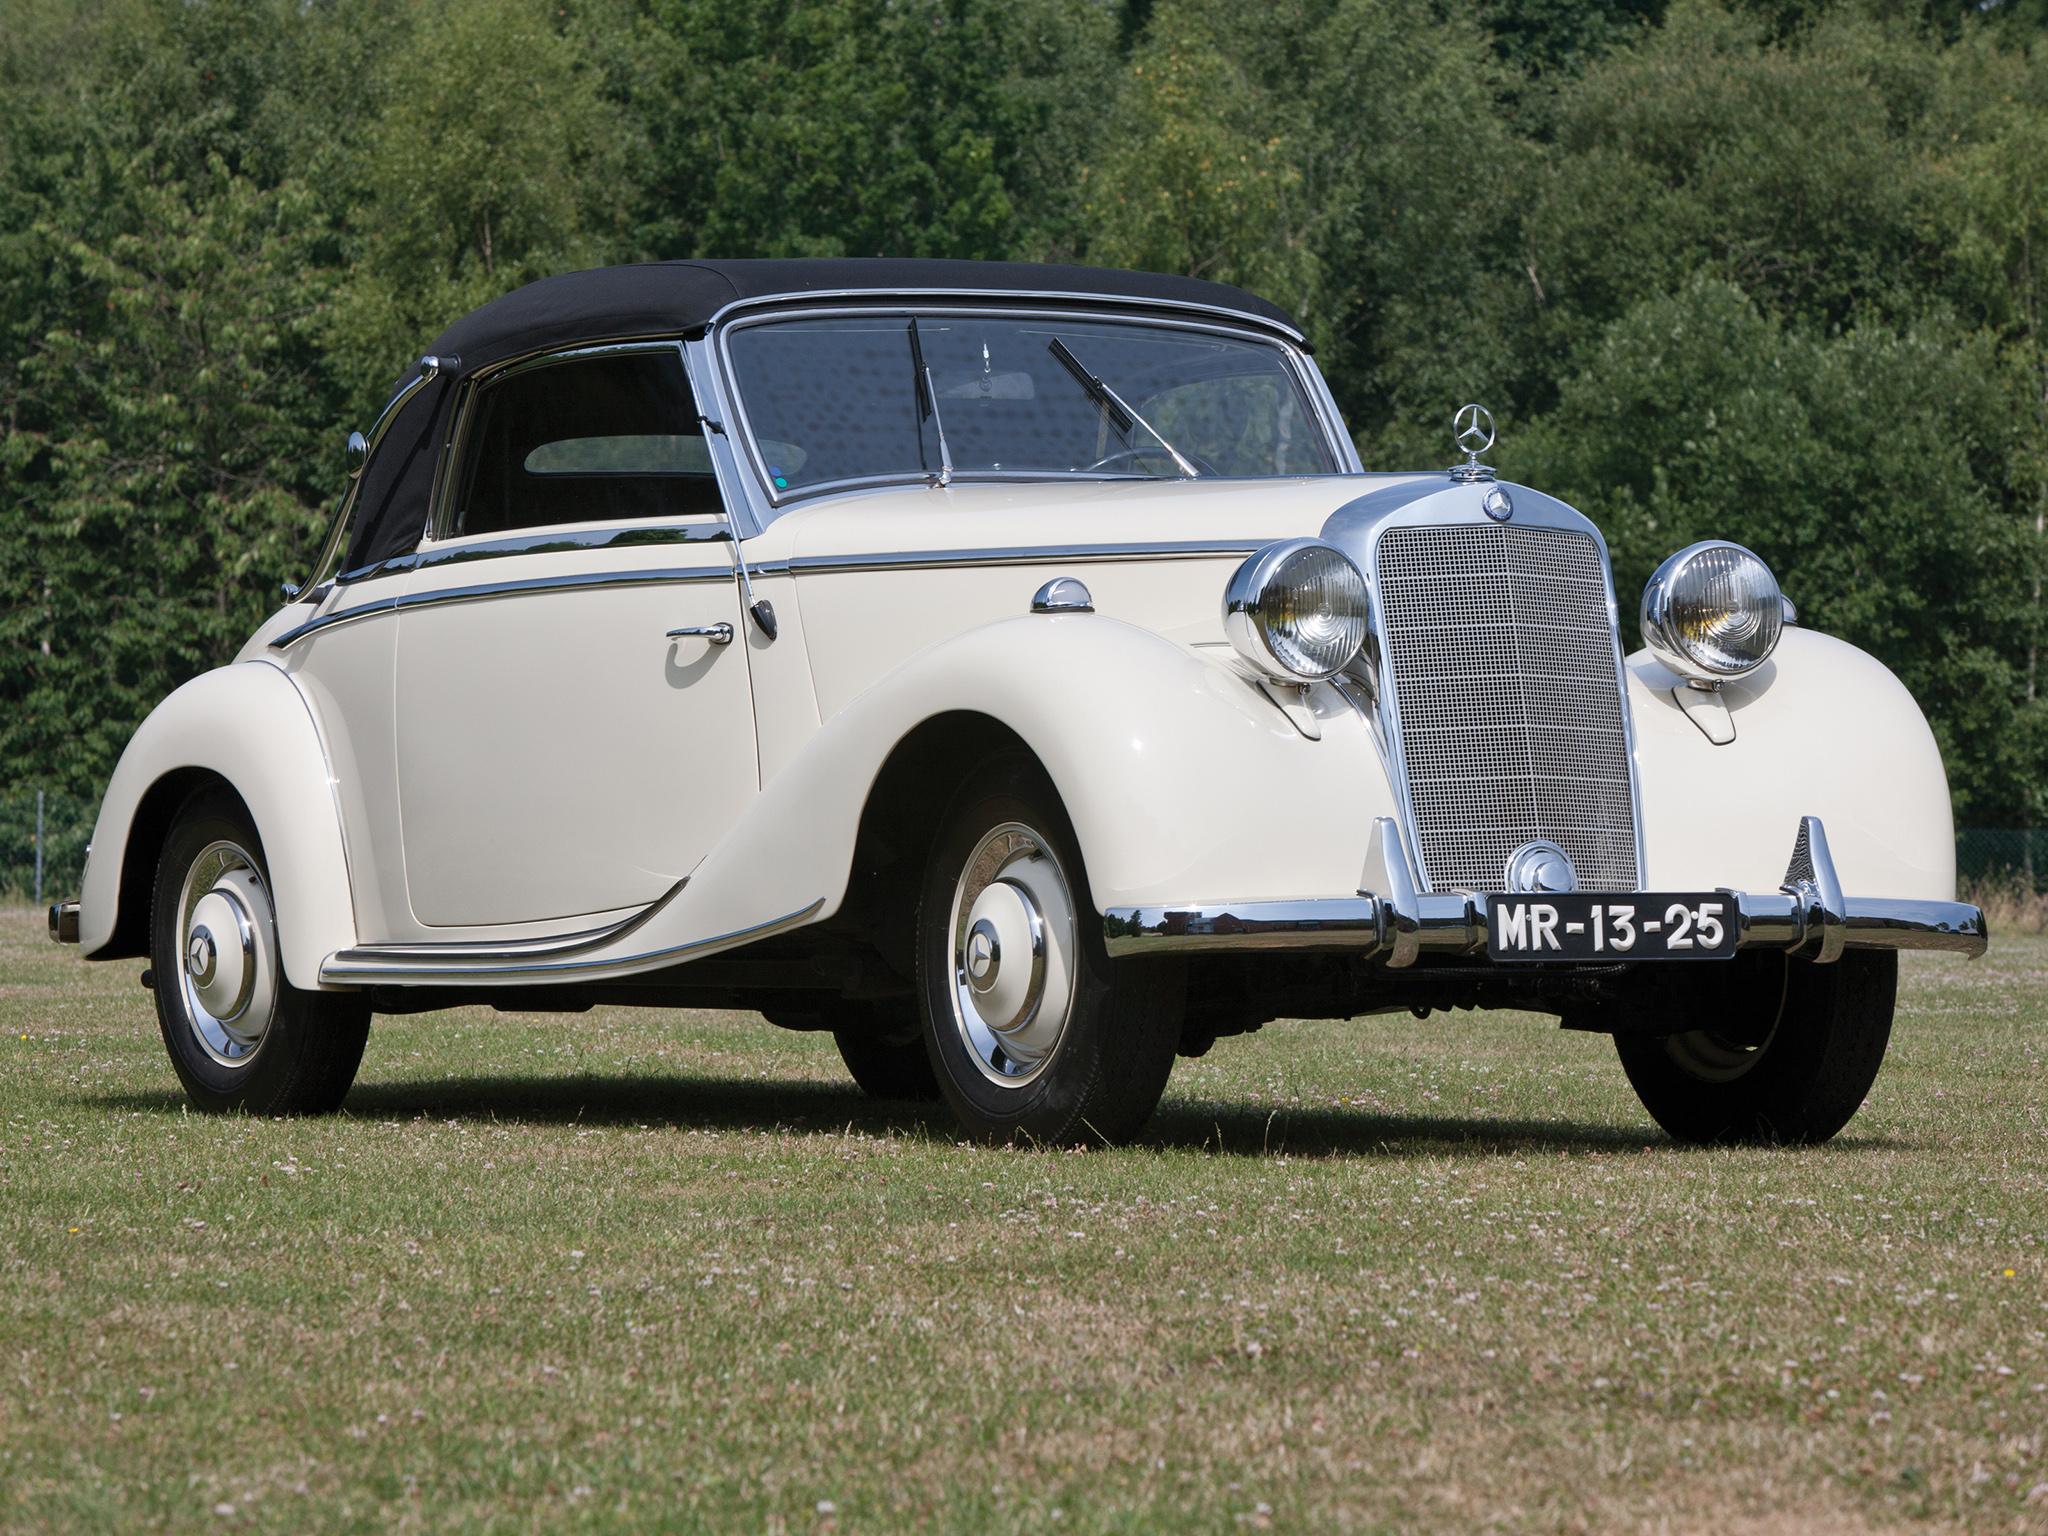 1949 mercedes benz 170 s cabriolet a w136iv retro luxury for 1949 mercedes benz